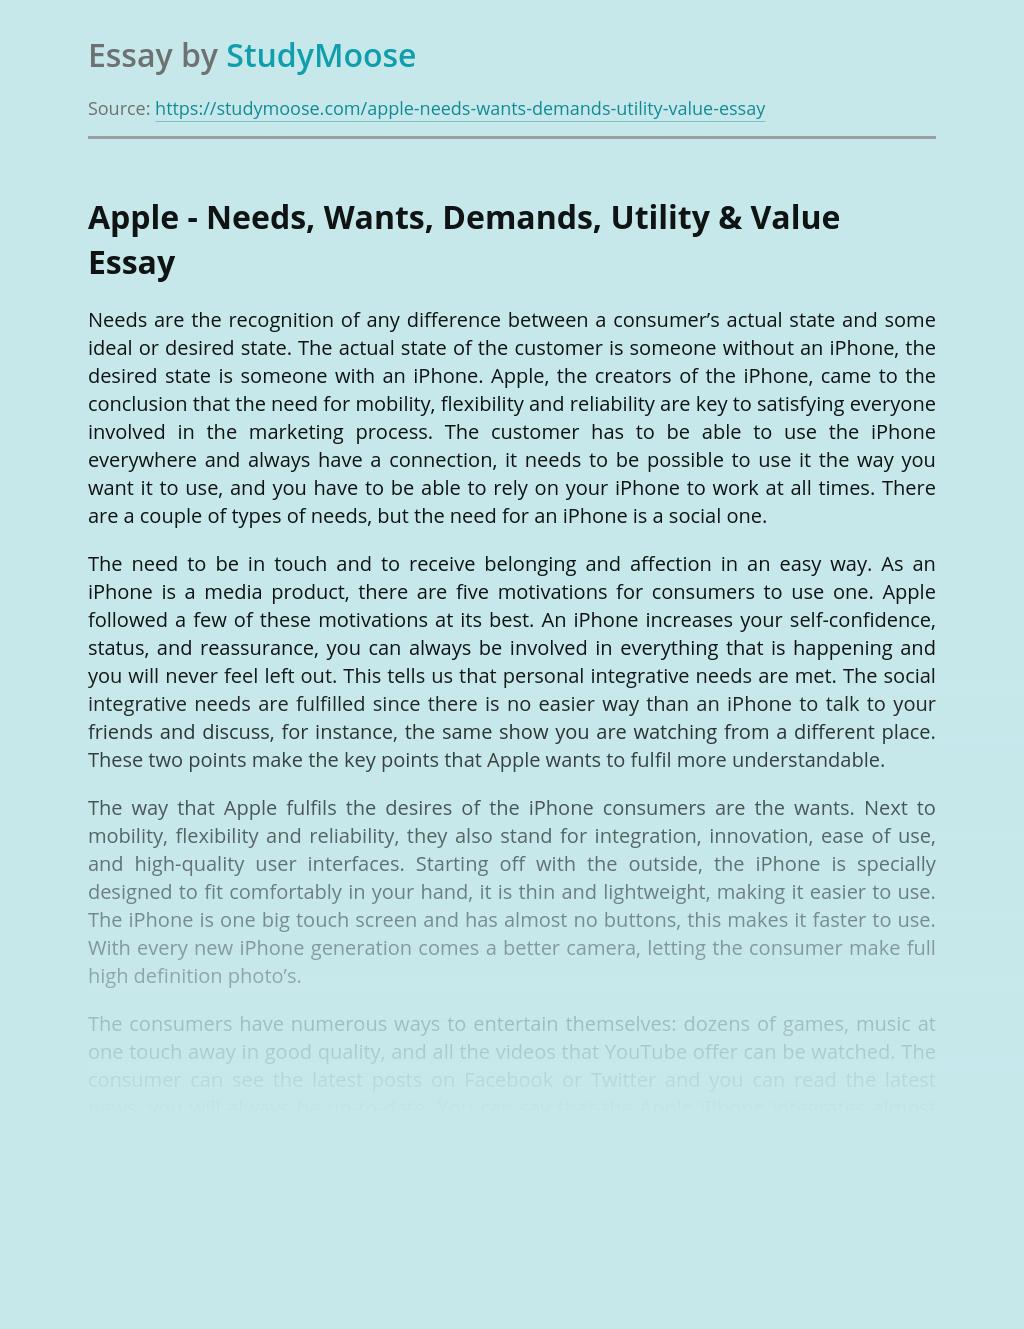 Apple - Needs, Wants, Demands, Utility & Value